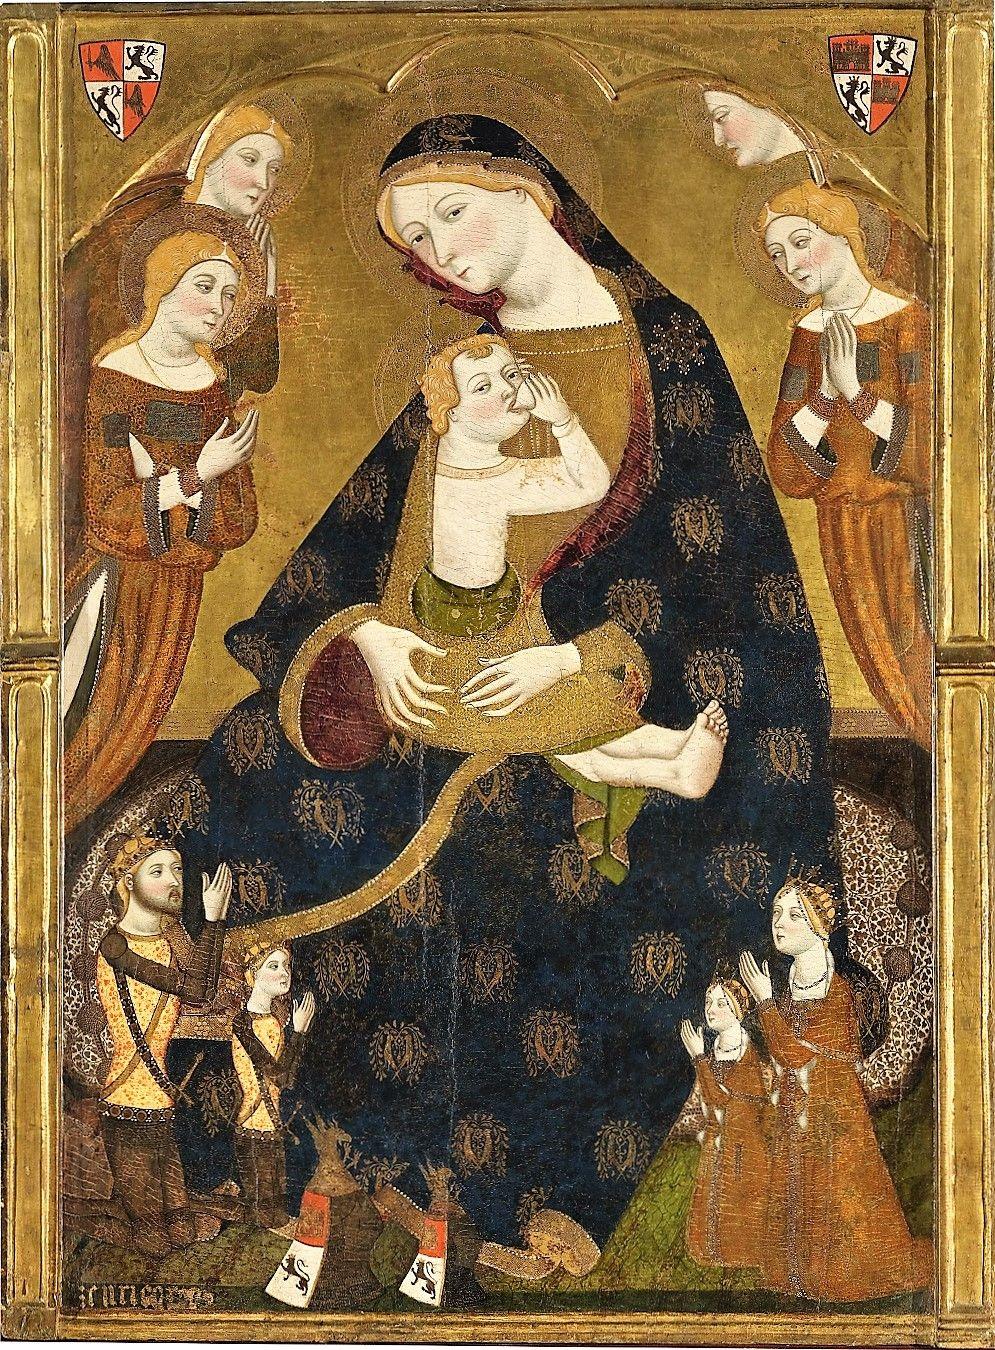 Jaume Serra (Catalonean artist, d c 1405) Virgen de Tobed 1359